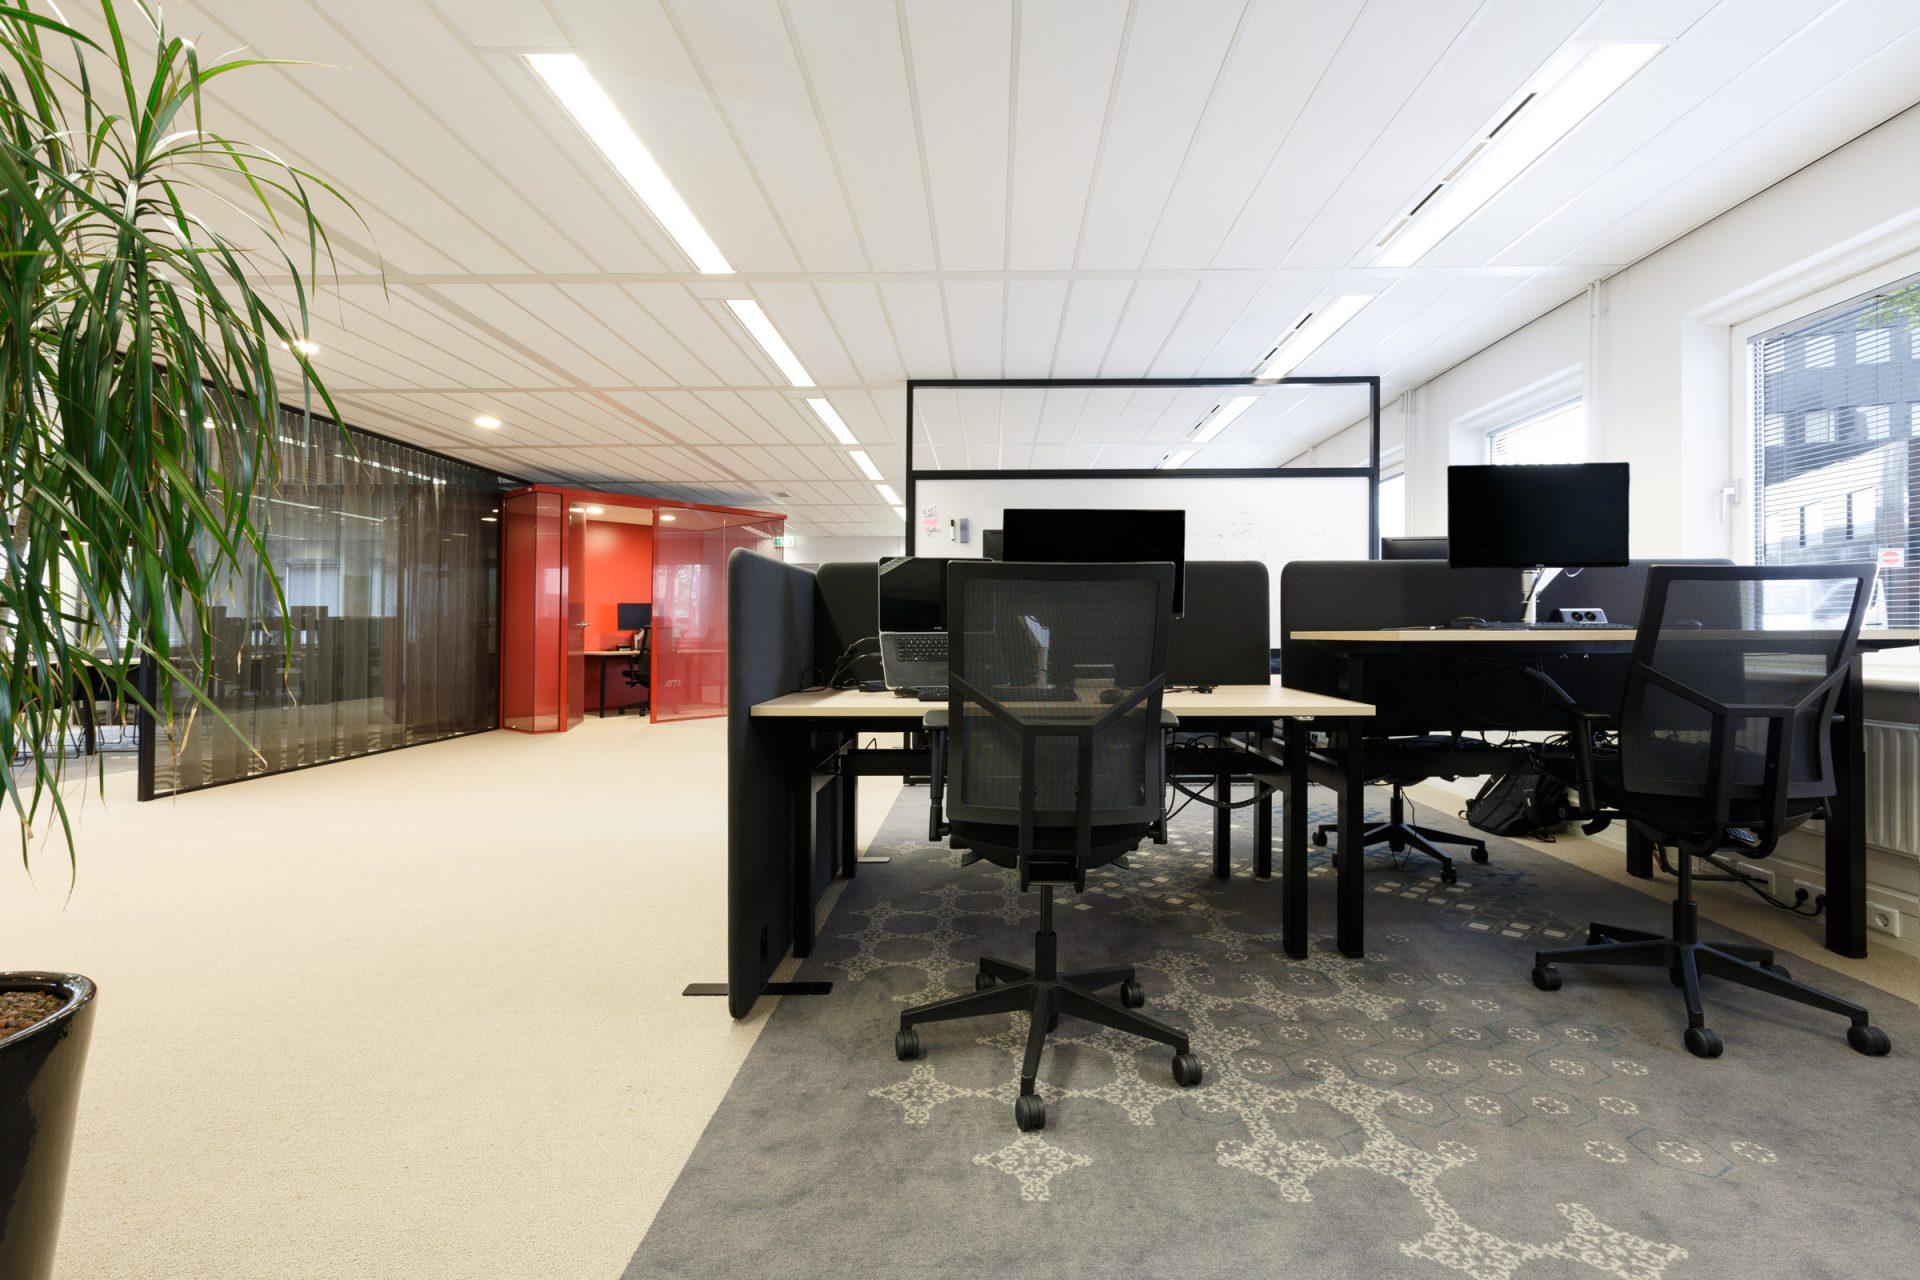 RubiX s-Hertogenbosch - Topperprojecten 2